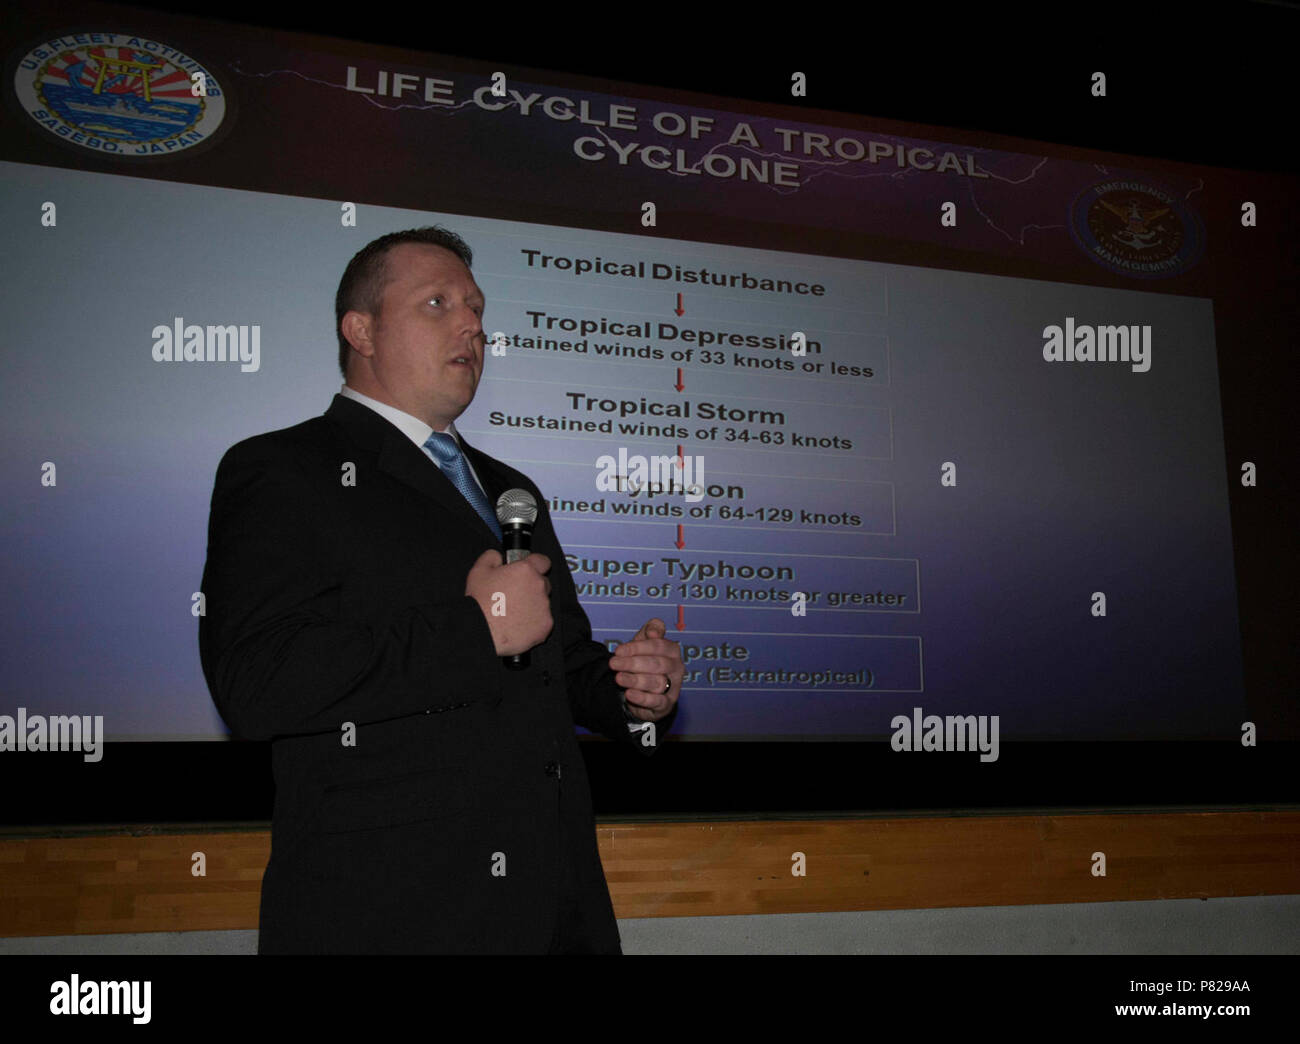 SASEBO, Japan (Apr. 18, 2016) David Johnston, Commander U.S. Fleet Activitives Sasebo emergency management officer, gives a typhoon readiness standdown presentation onboard CFAS Apr. 19, 2016. Stock Photo